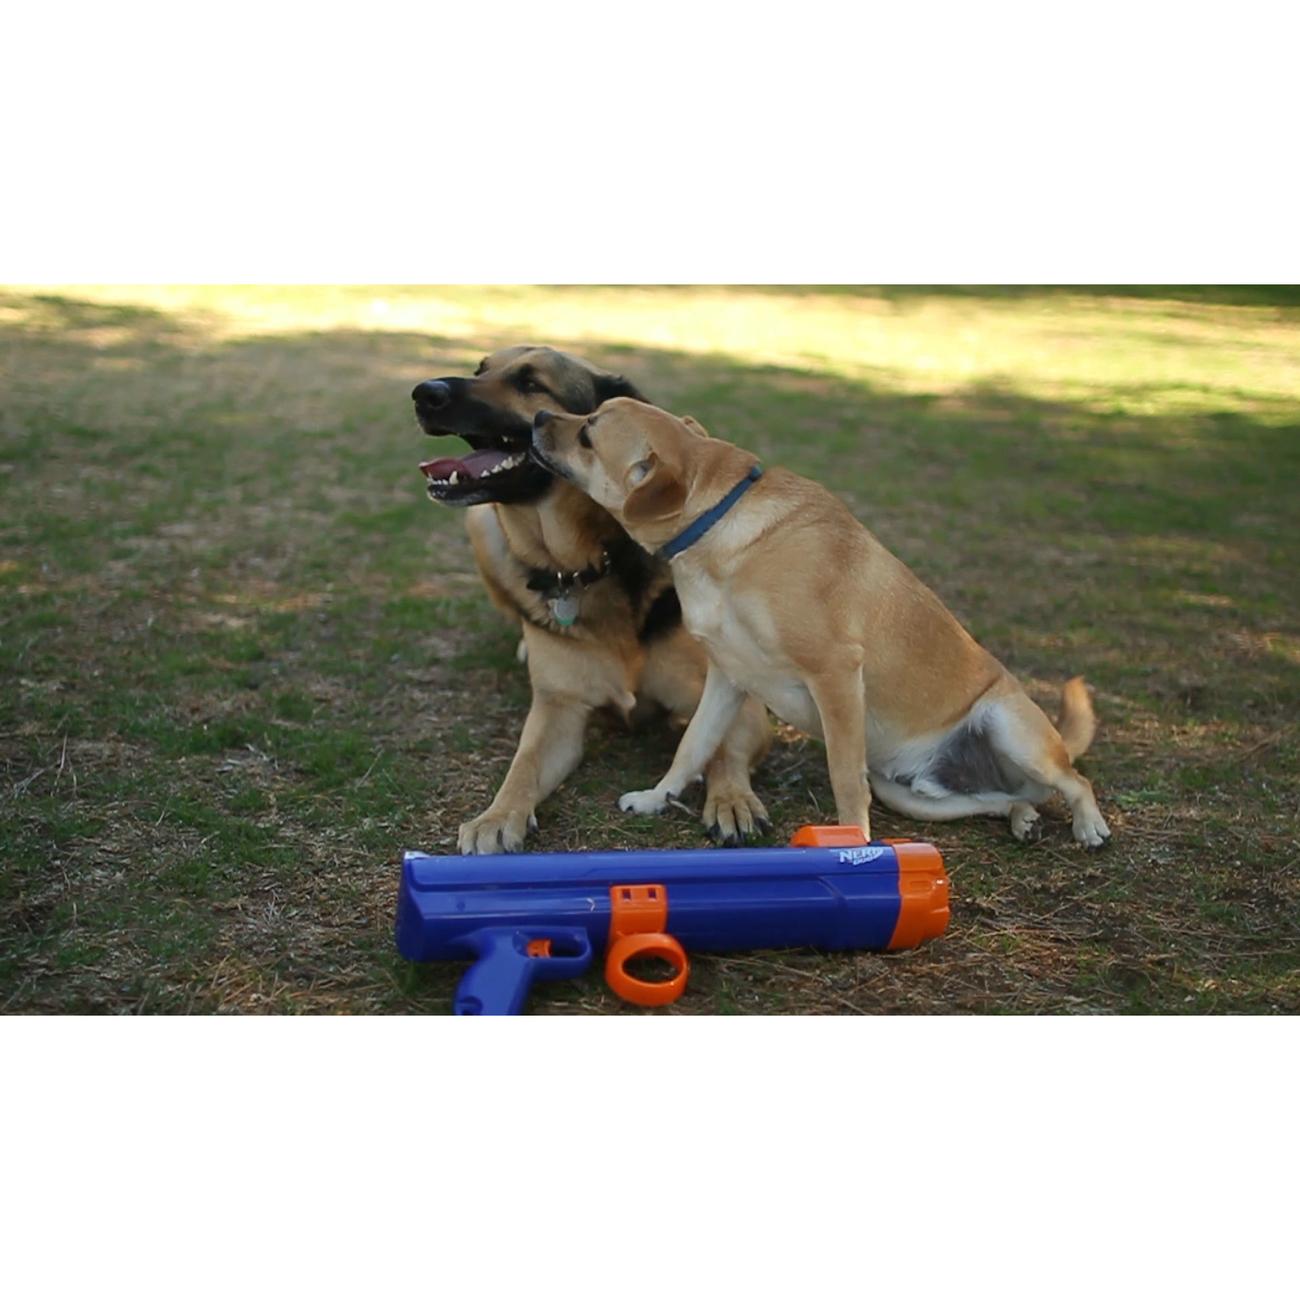 NERF Dog Tennisball Blaster Ballkanone, Bild 9